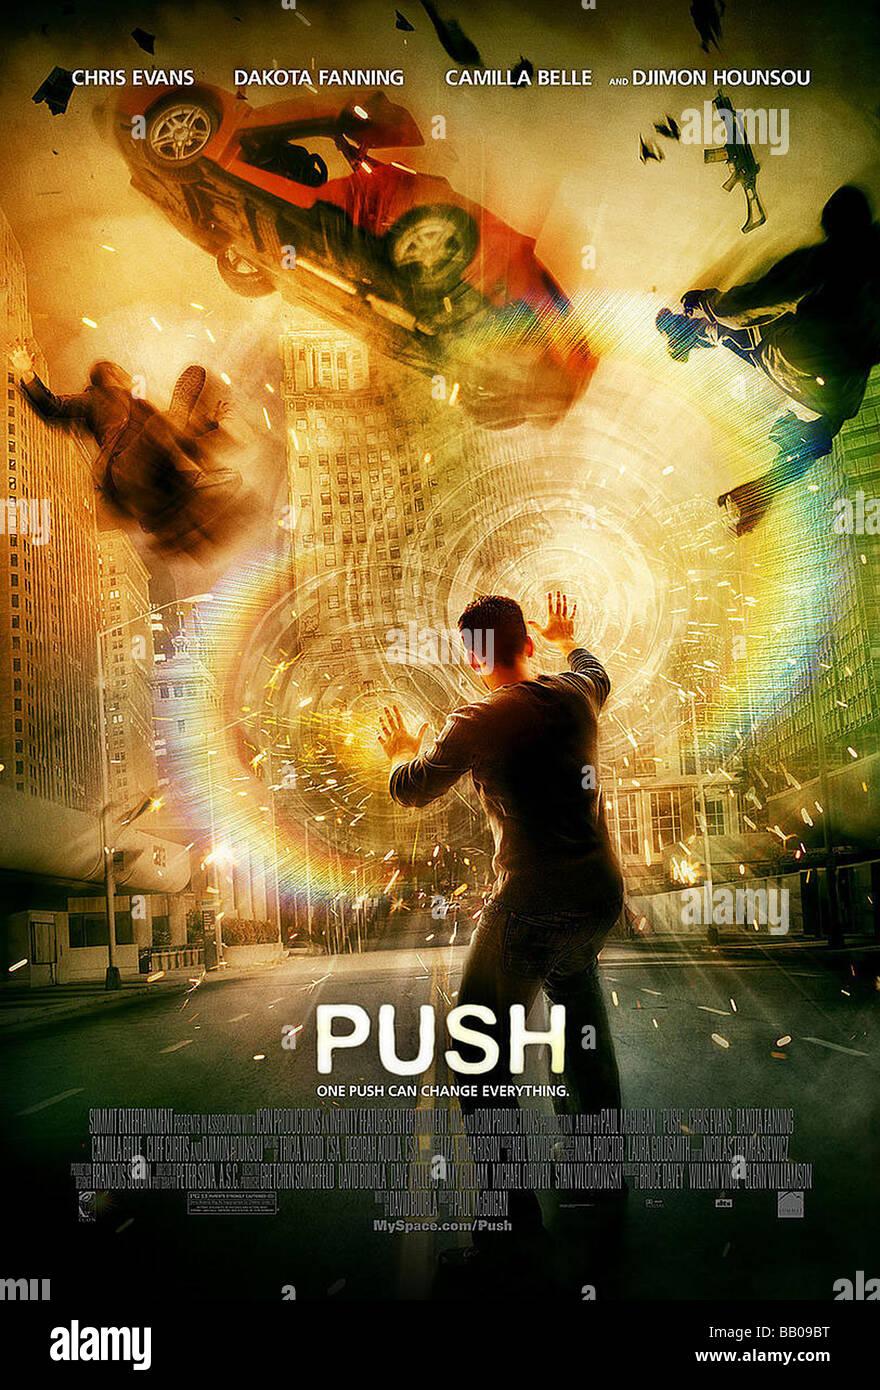 Push Year : 2009 Director : Paul McGuigan Movie poster - Stock Image